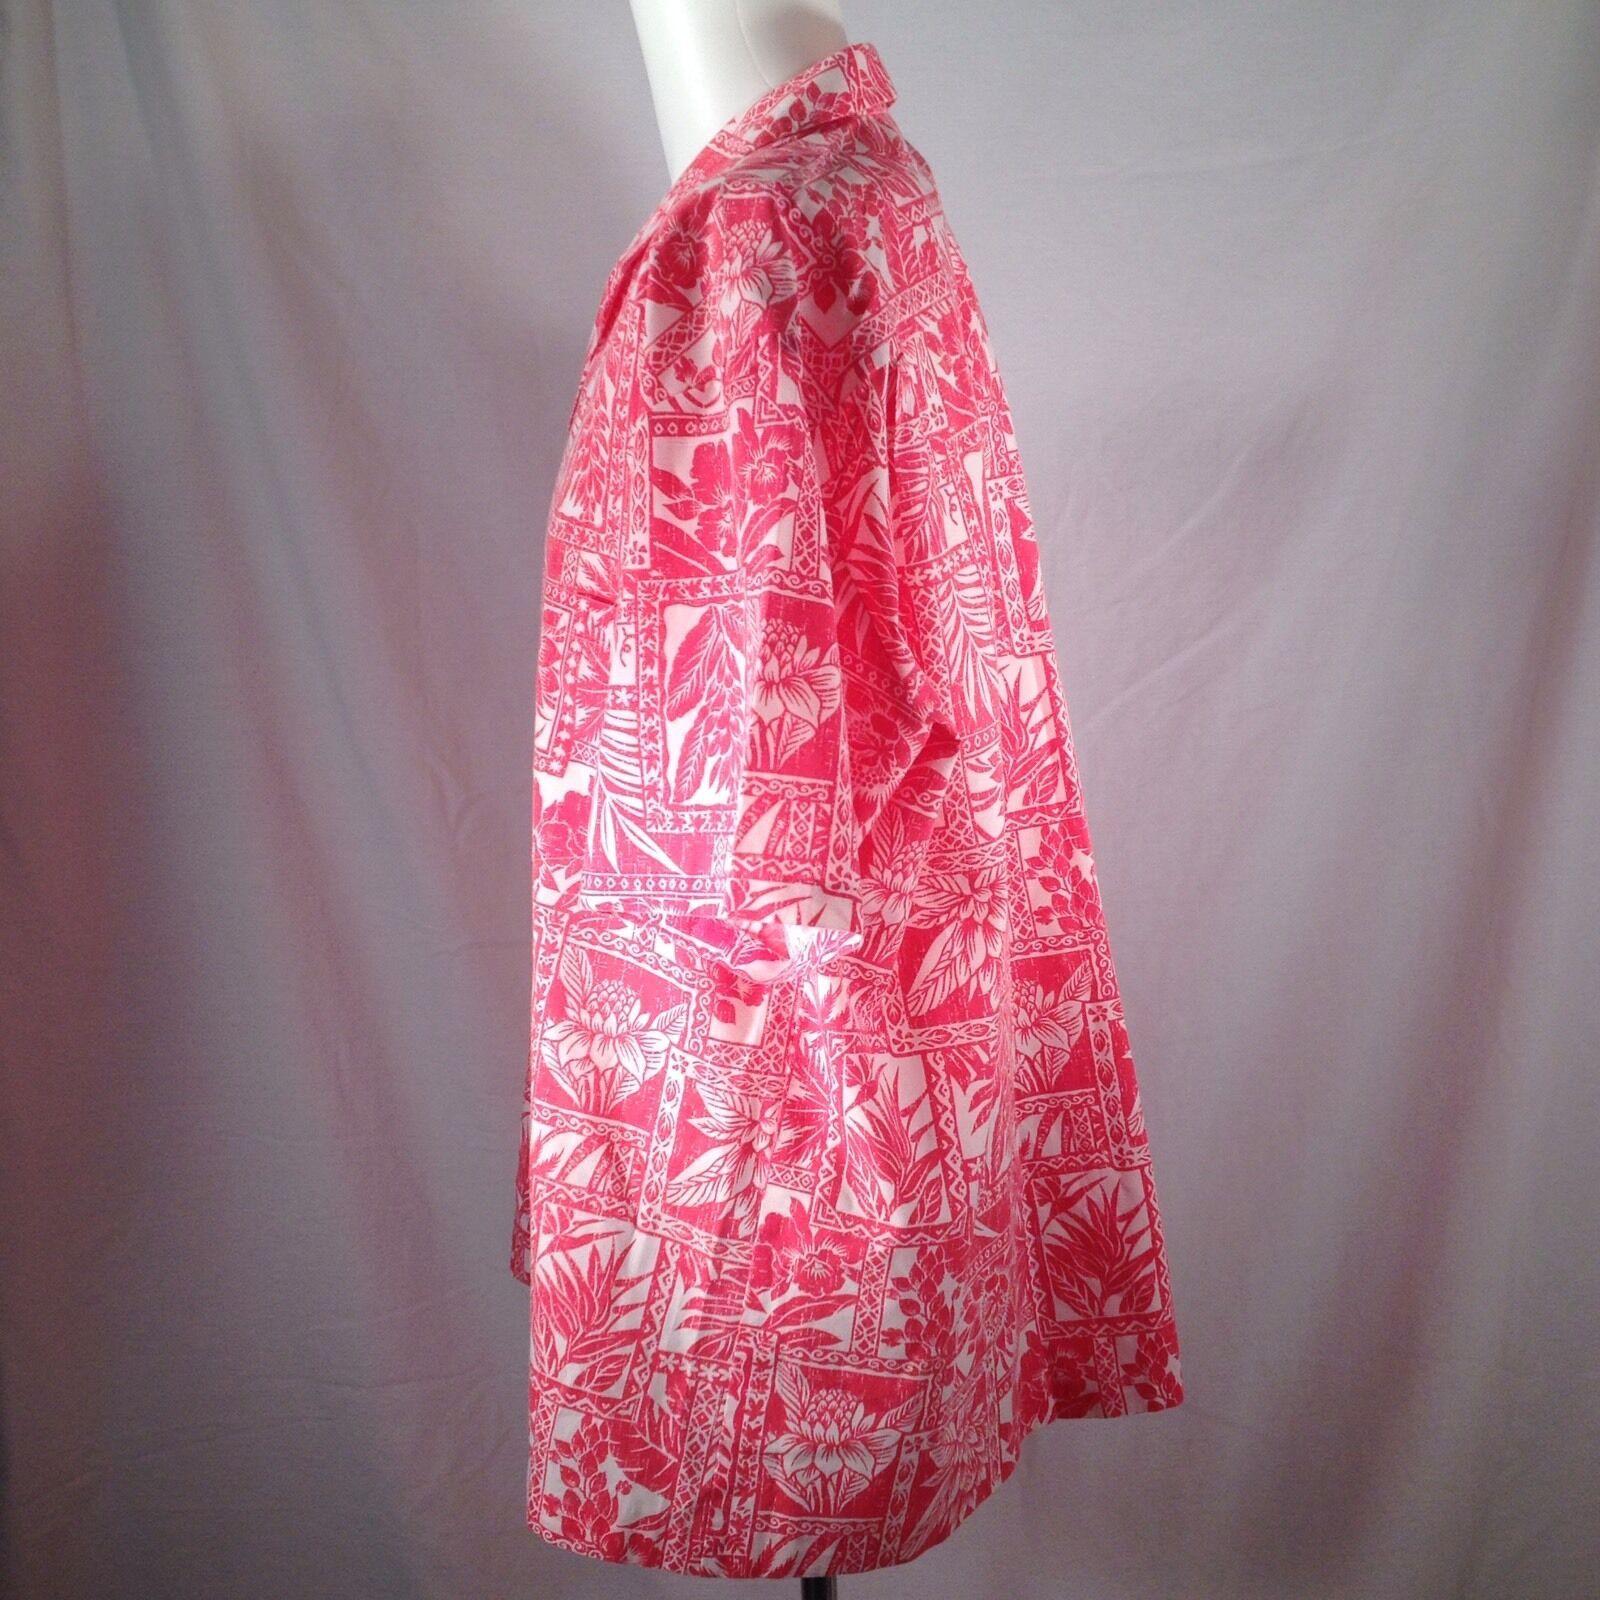 Royal Creations Hawaiian Shirt XL Aloha Floral Batik Matched Pocket Botanical